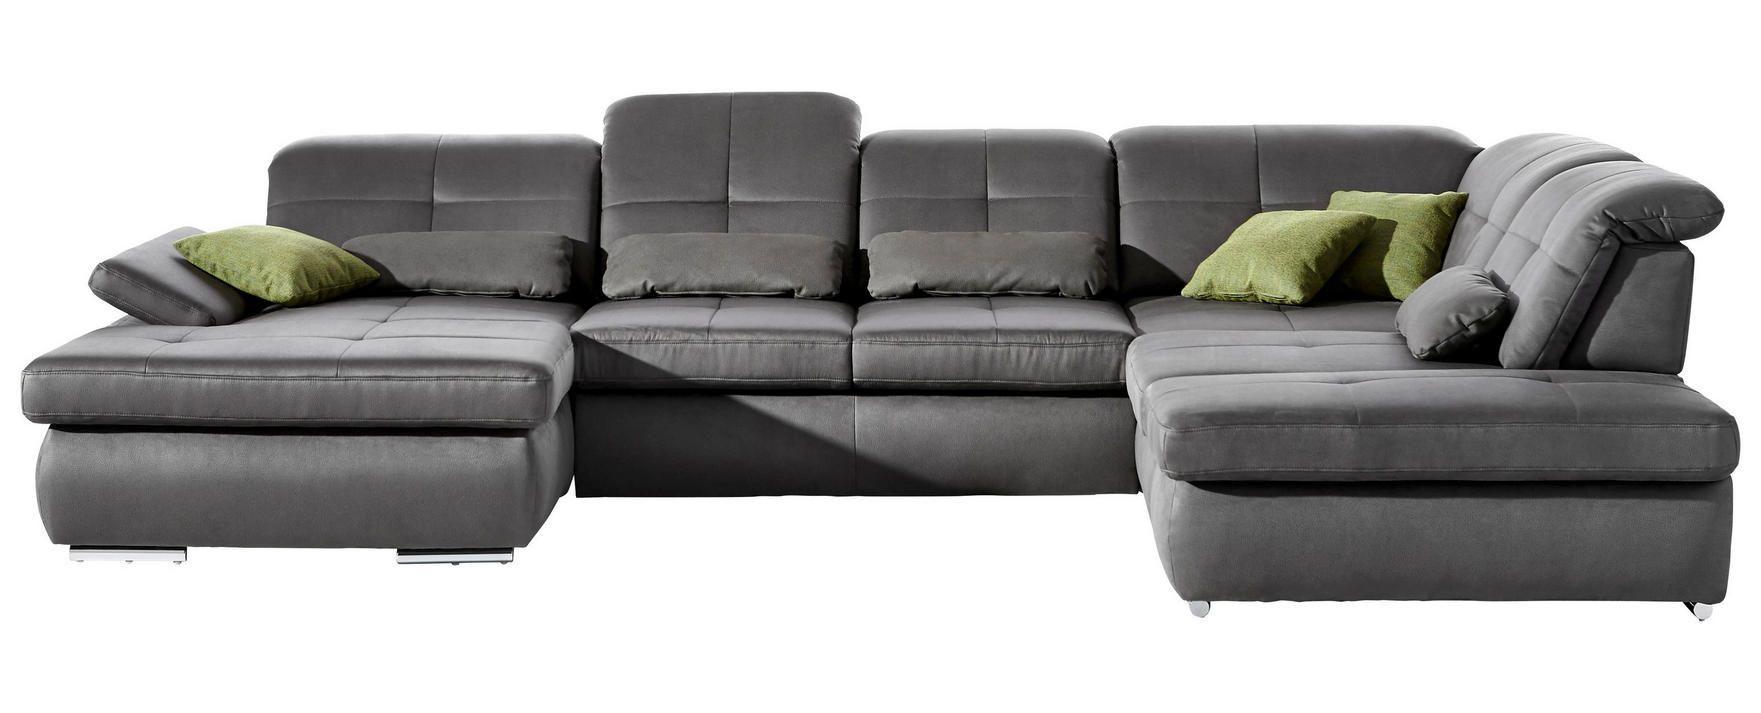 Beldomo Speed Sofa